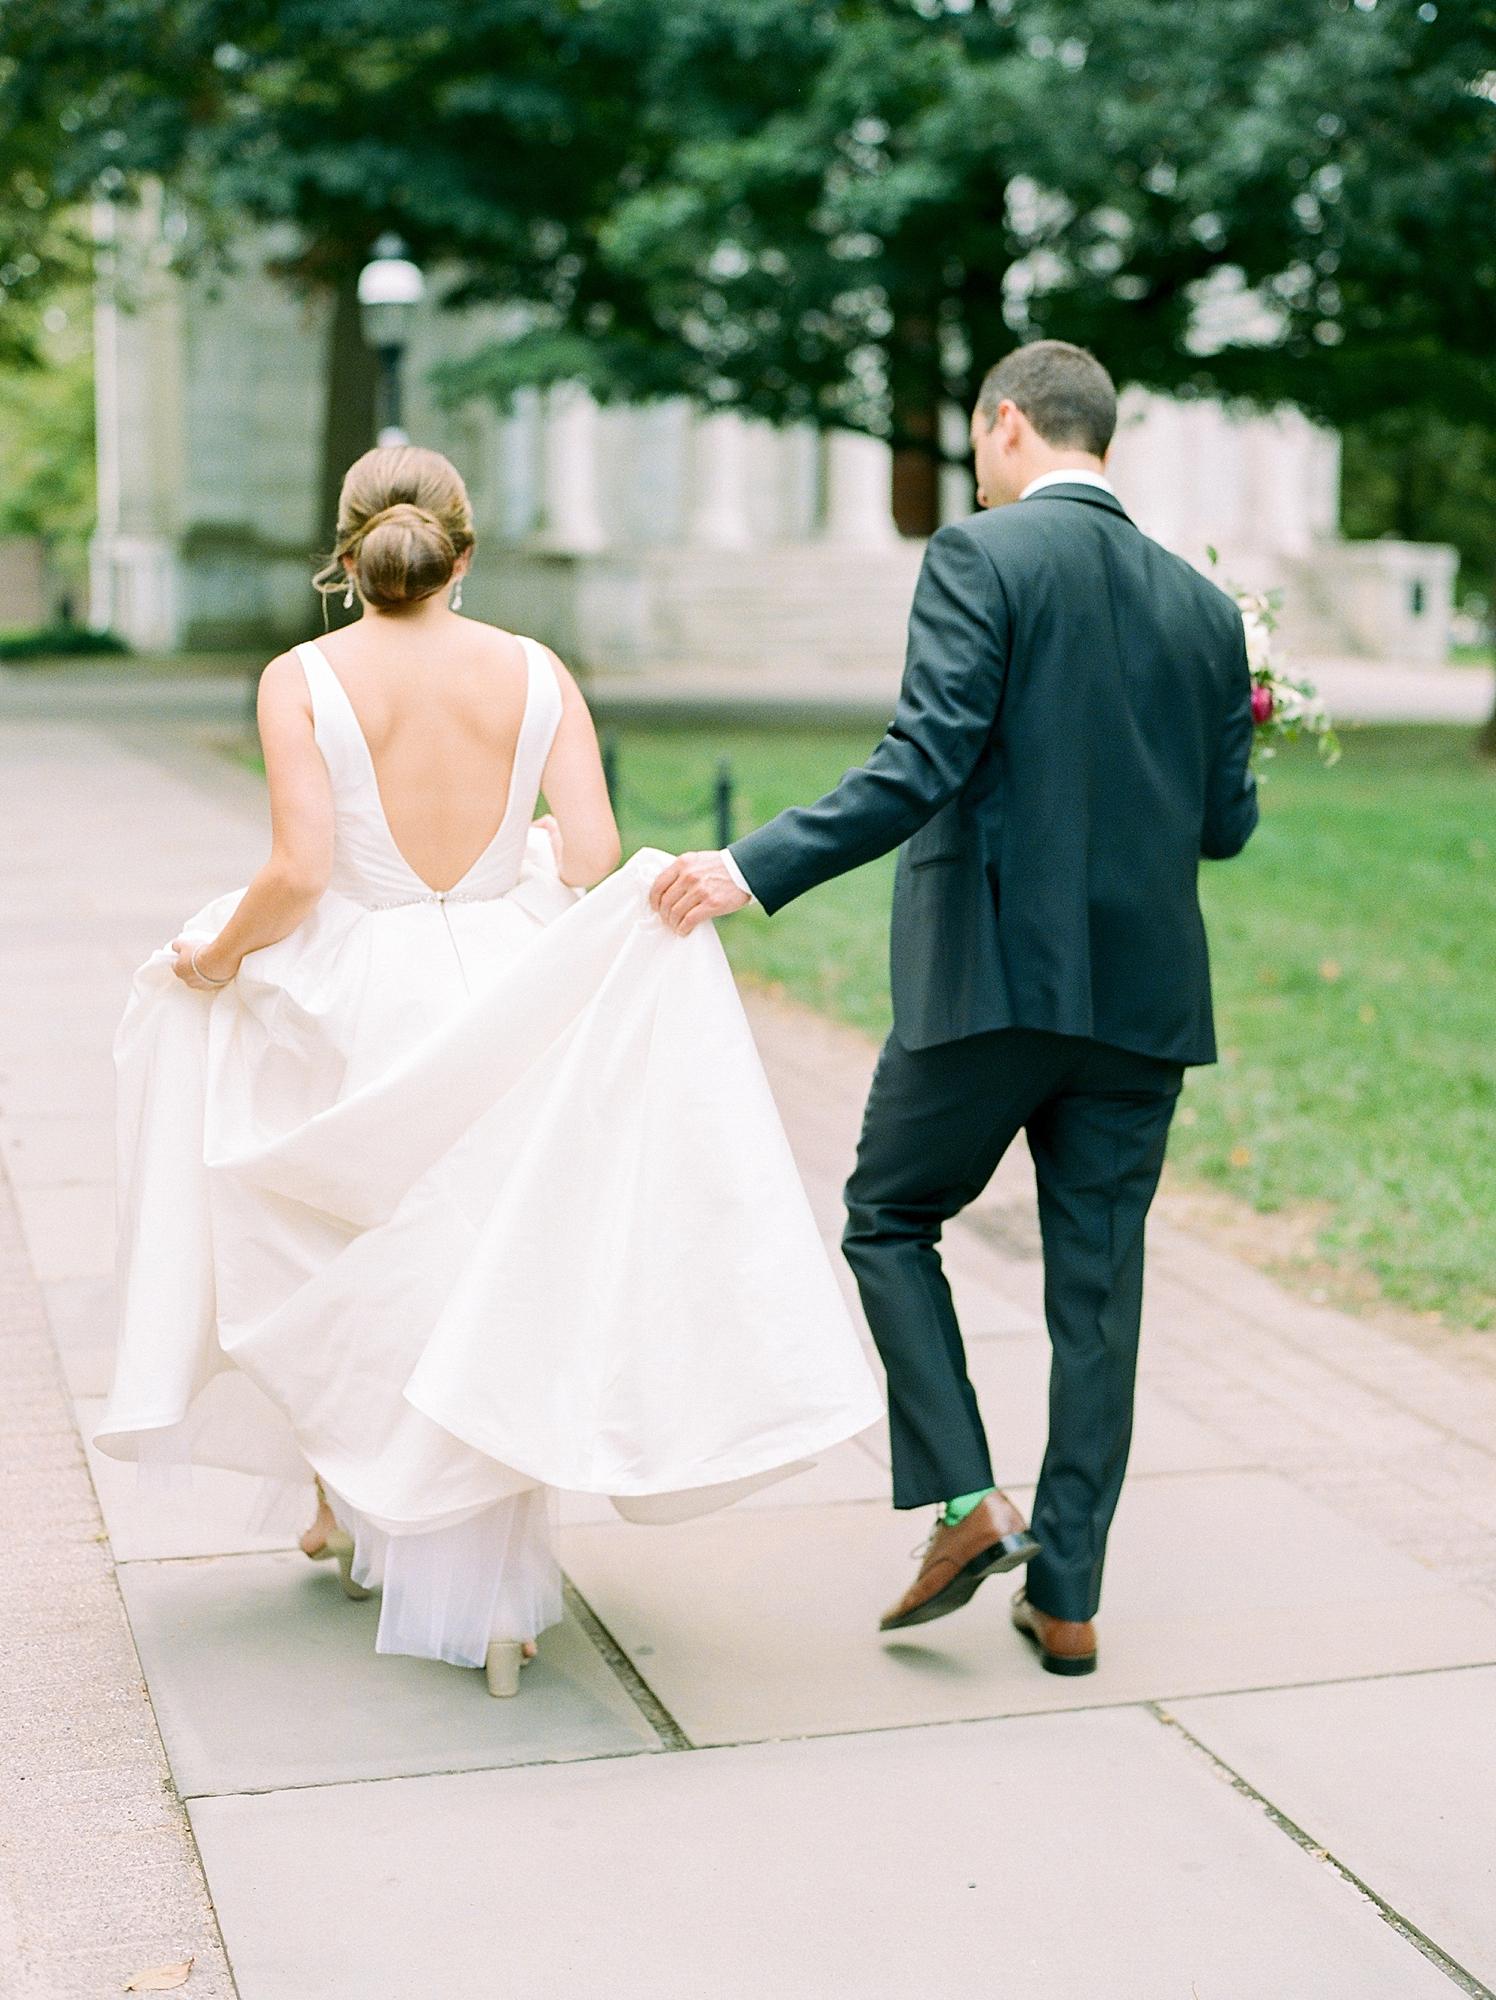 Princeton New Jersey Film Wedding Photographer Princeton University Wedding Photography by Magdalena Studios NJ Wedding Photographer51